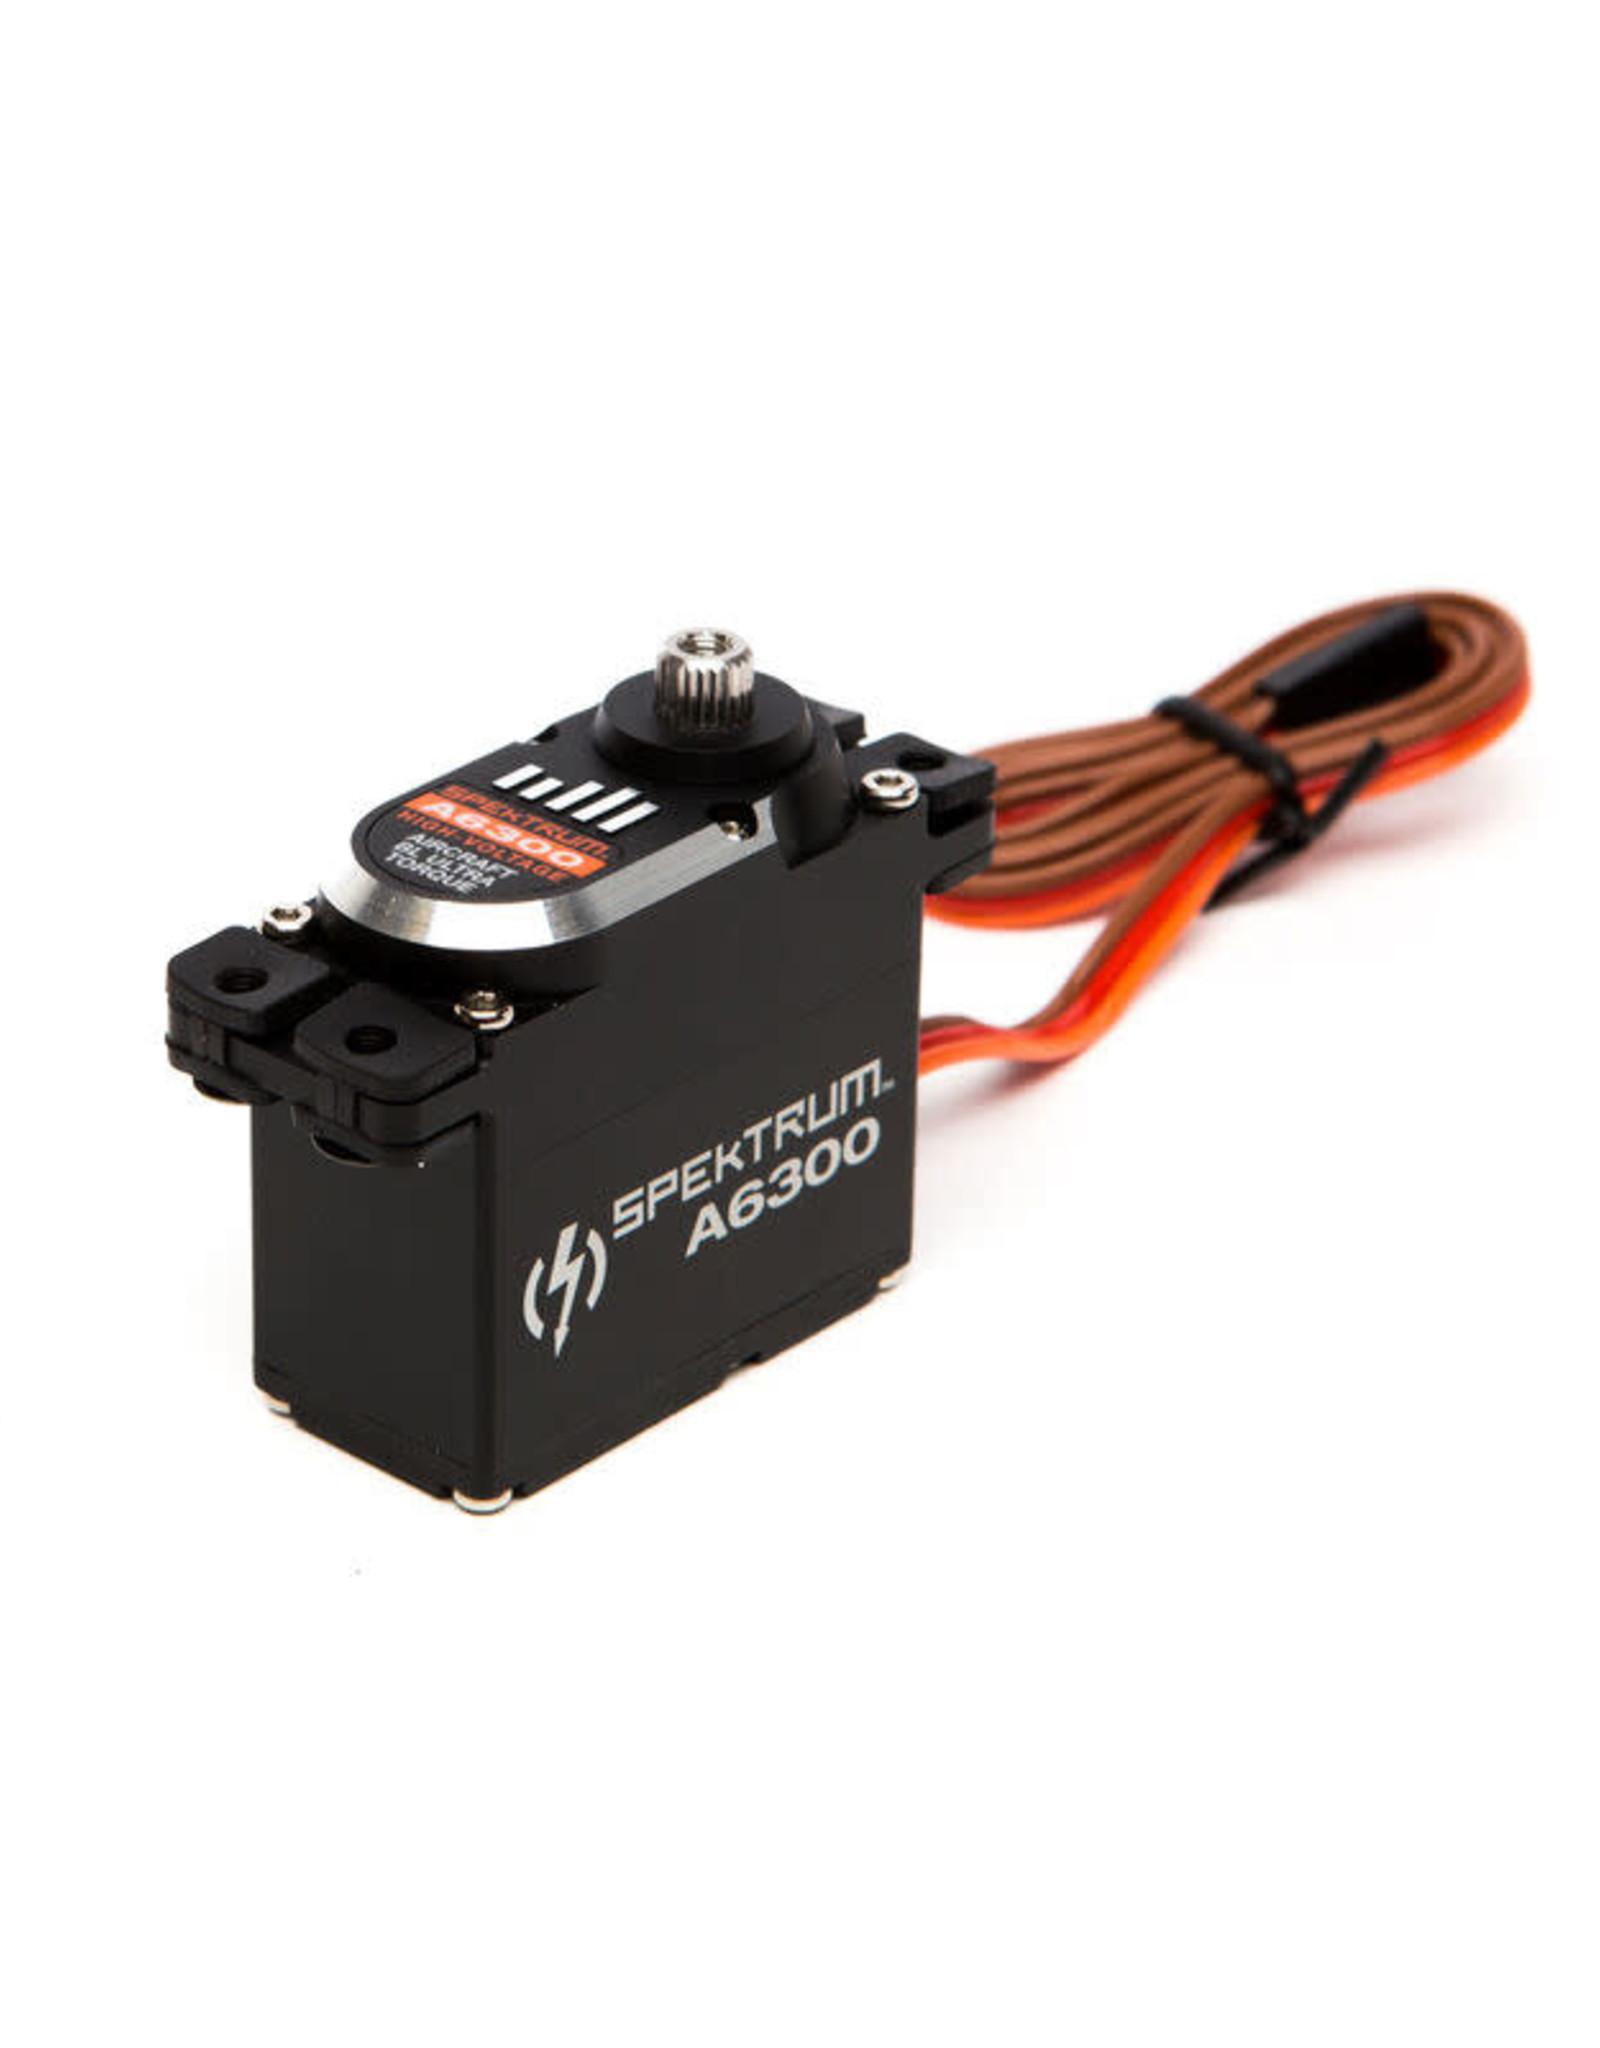 SPM SPMSA6300 A6300 Ultra Torque High Speed Metal BL HV Servo